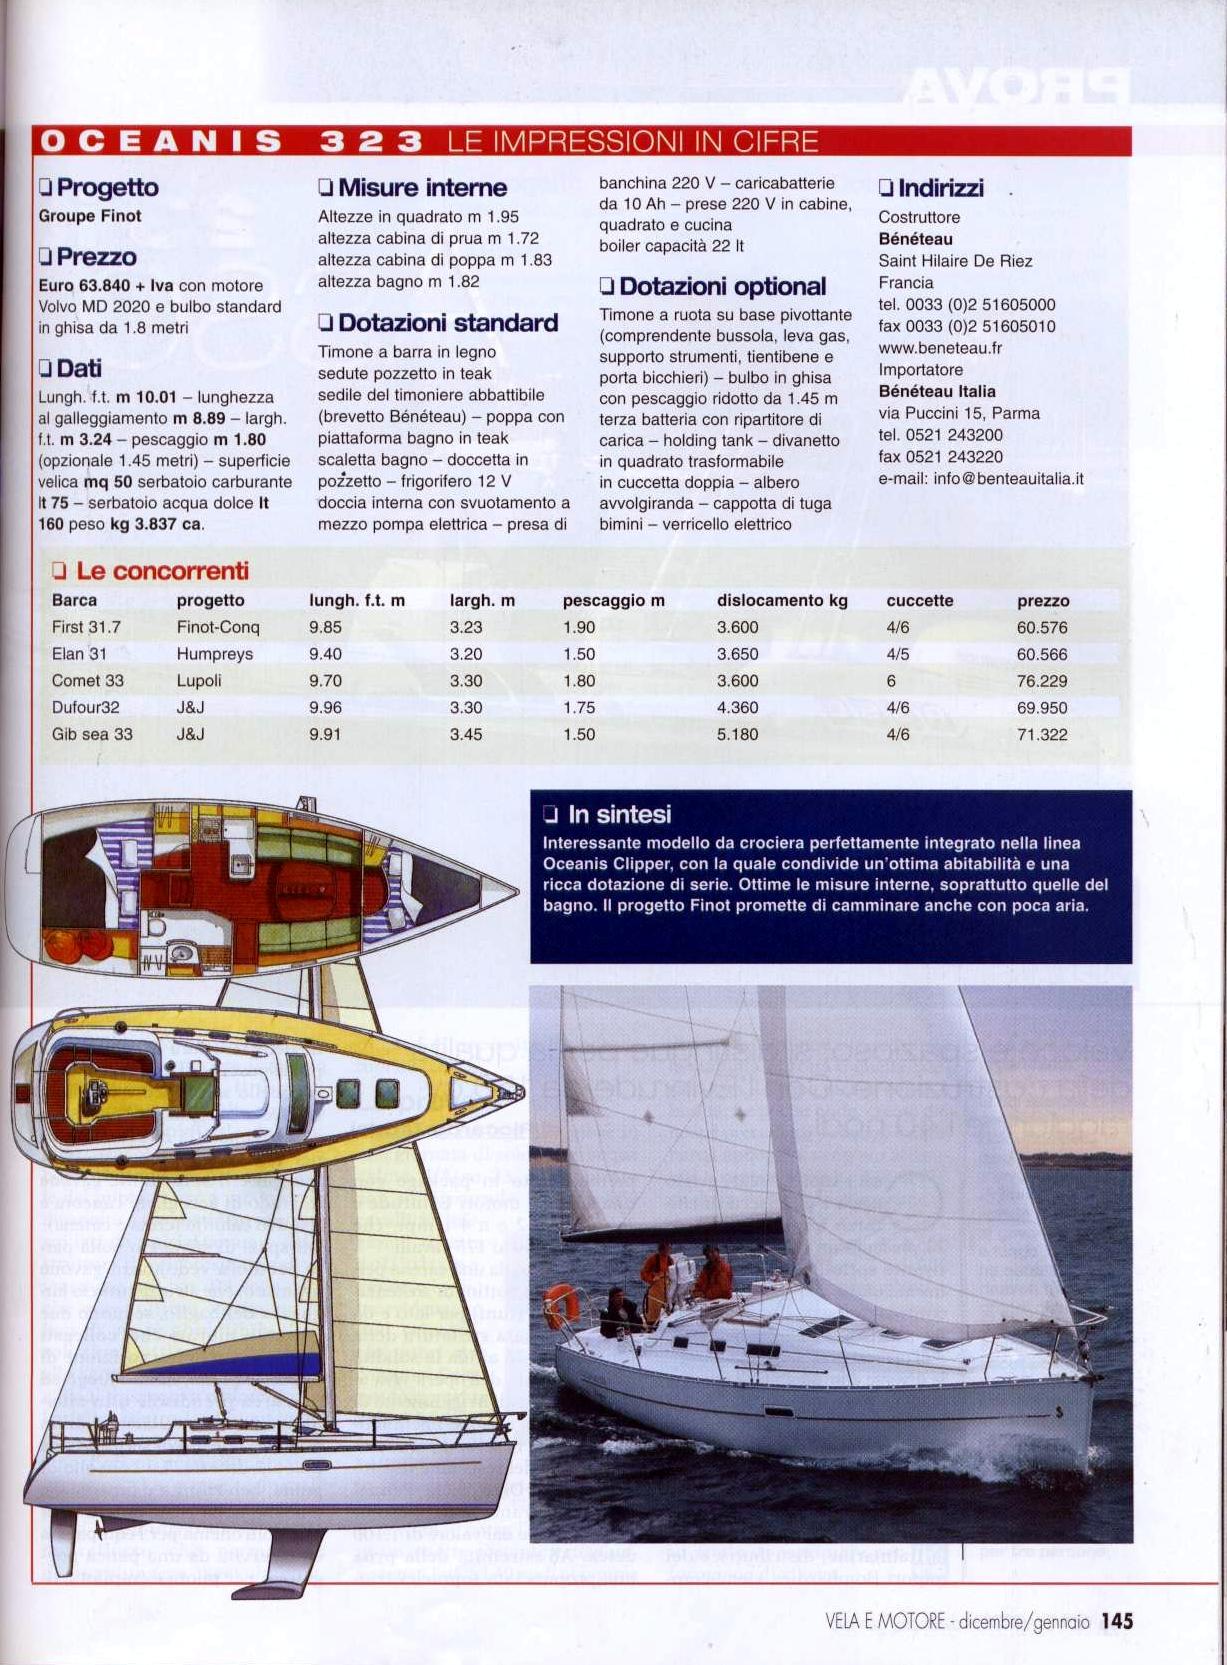 oceanis-323-vela-e-motore-gennaio-2004-3